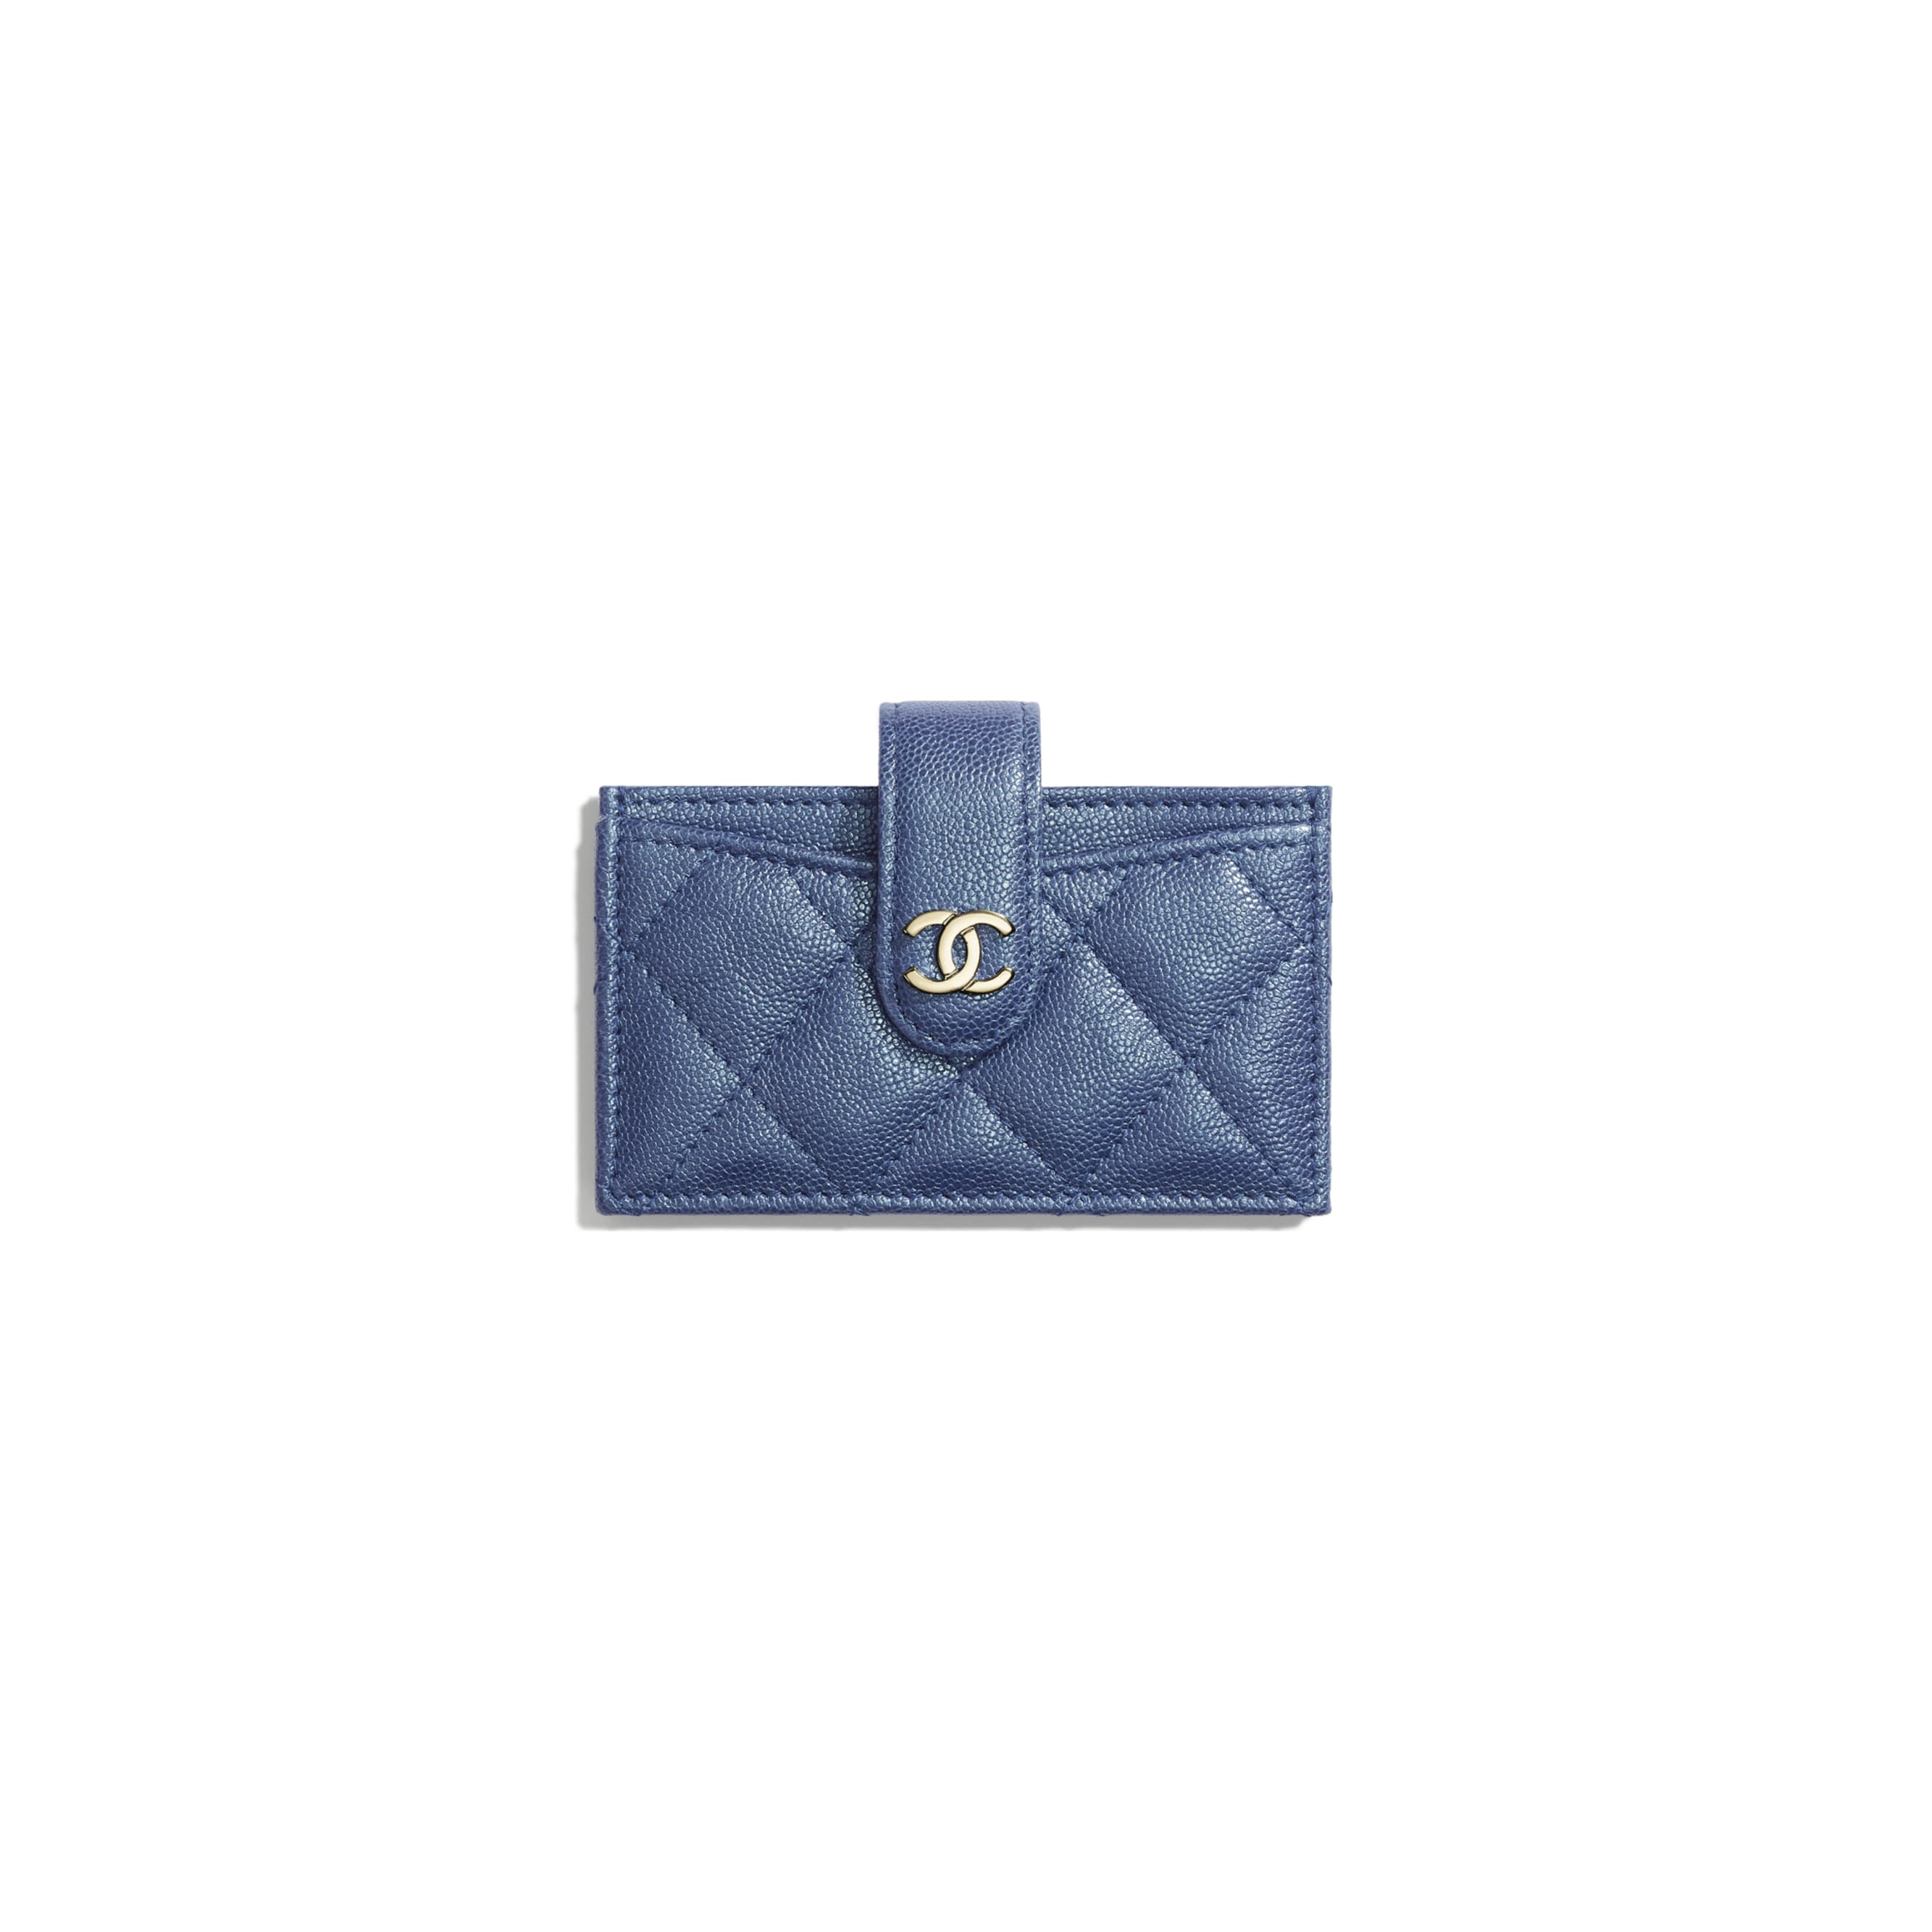 Card Holder - Dark Blue - Iridescent Grained Calfskin & Gold-Tone Metal - Default view - see standard sized version